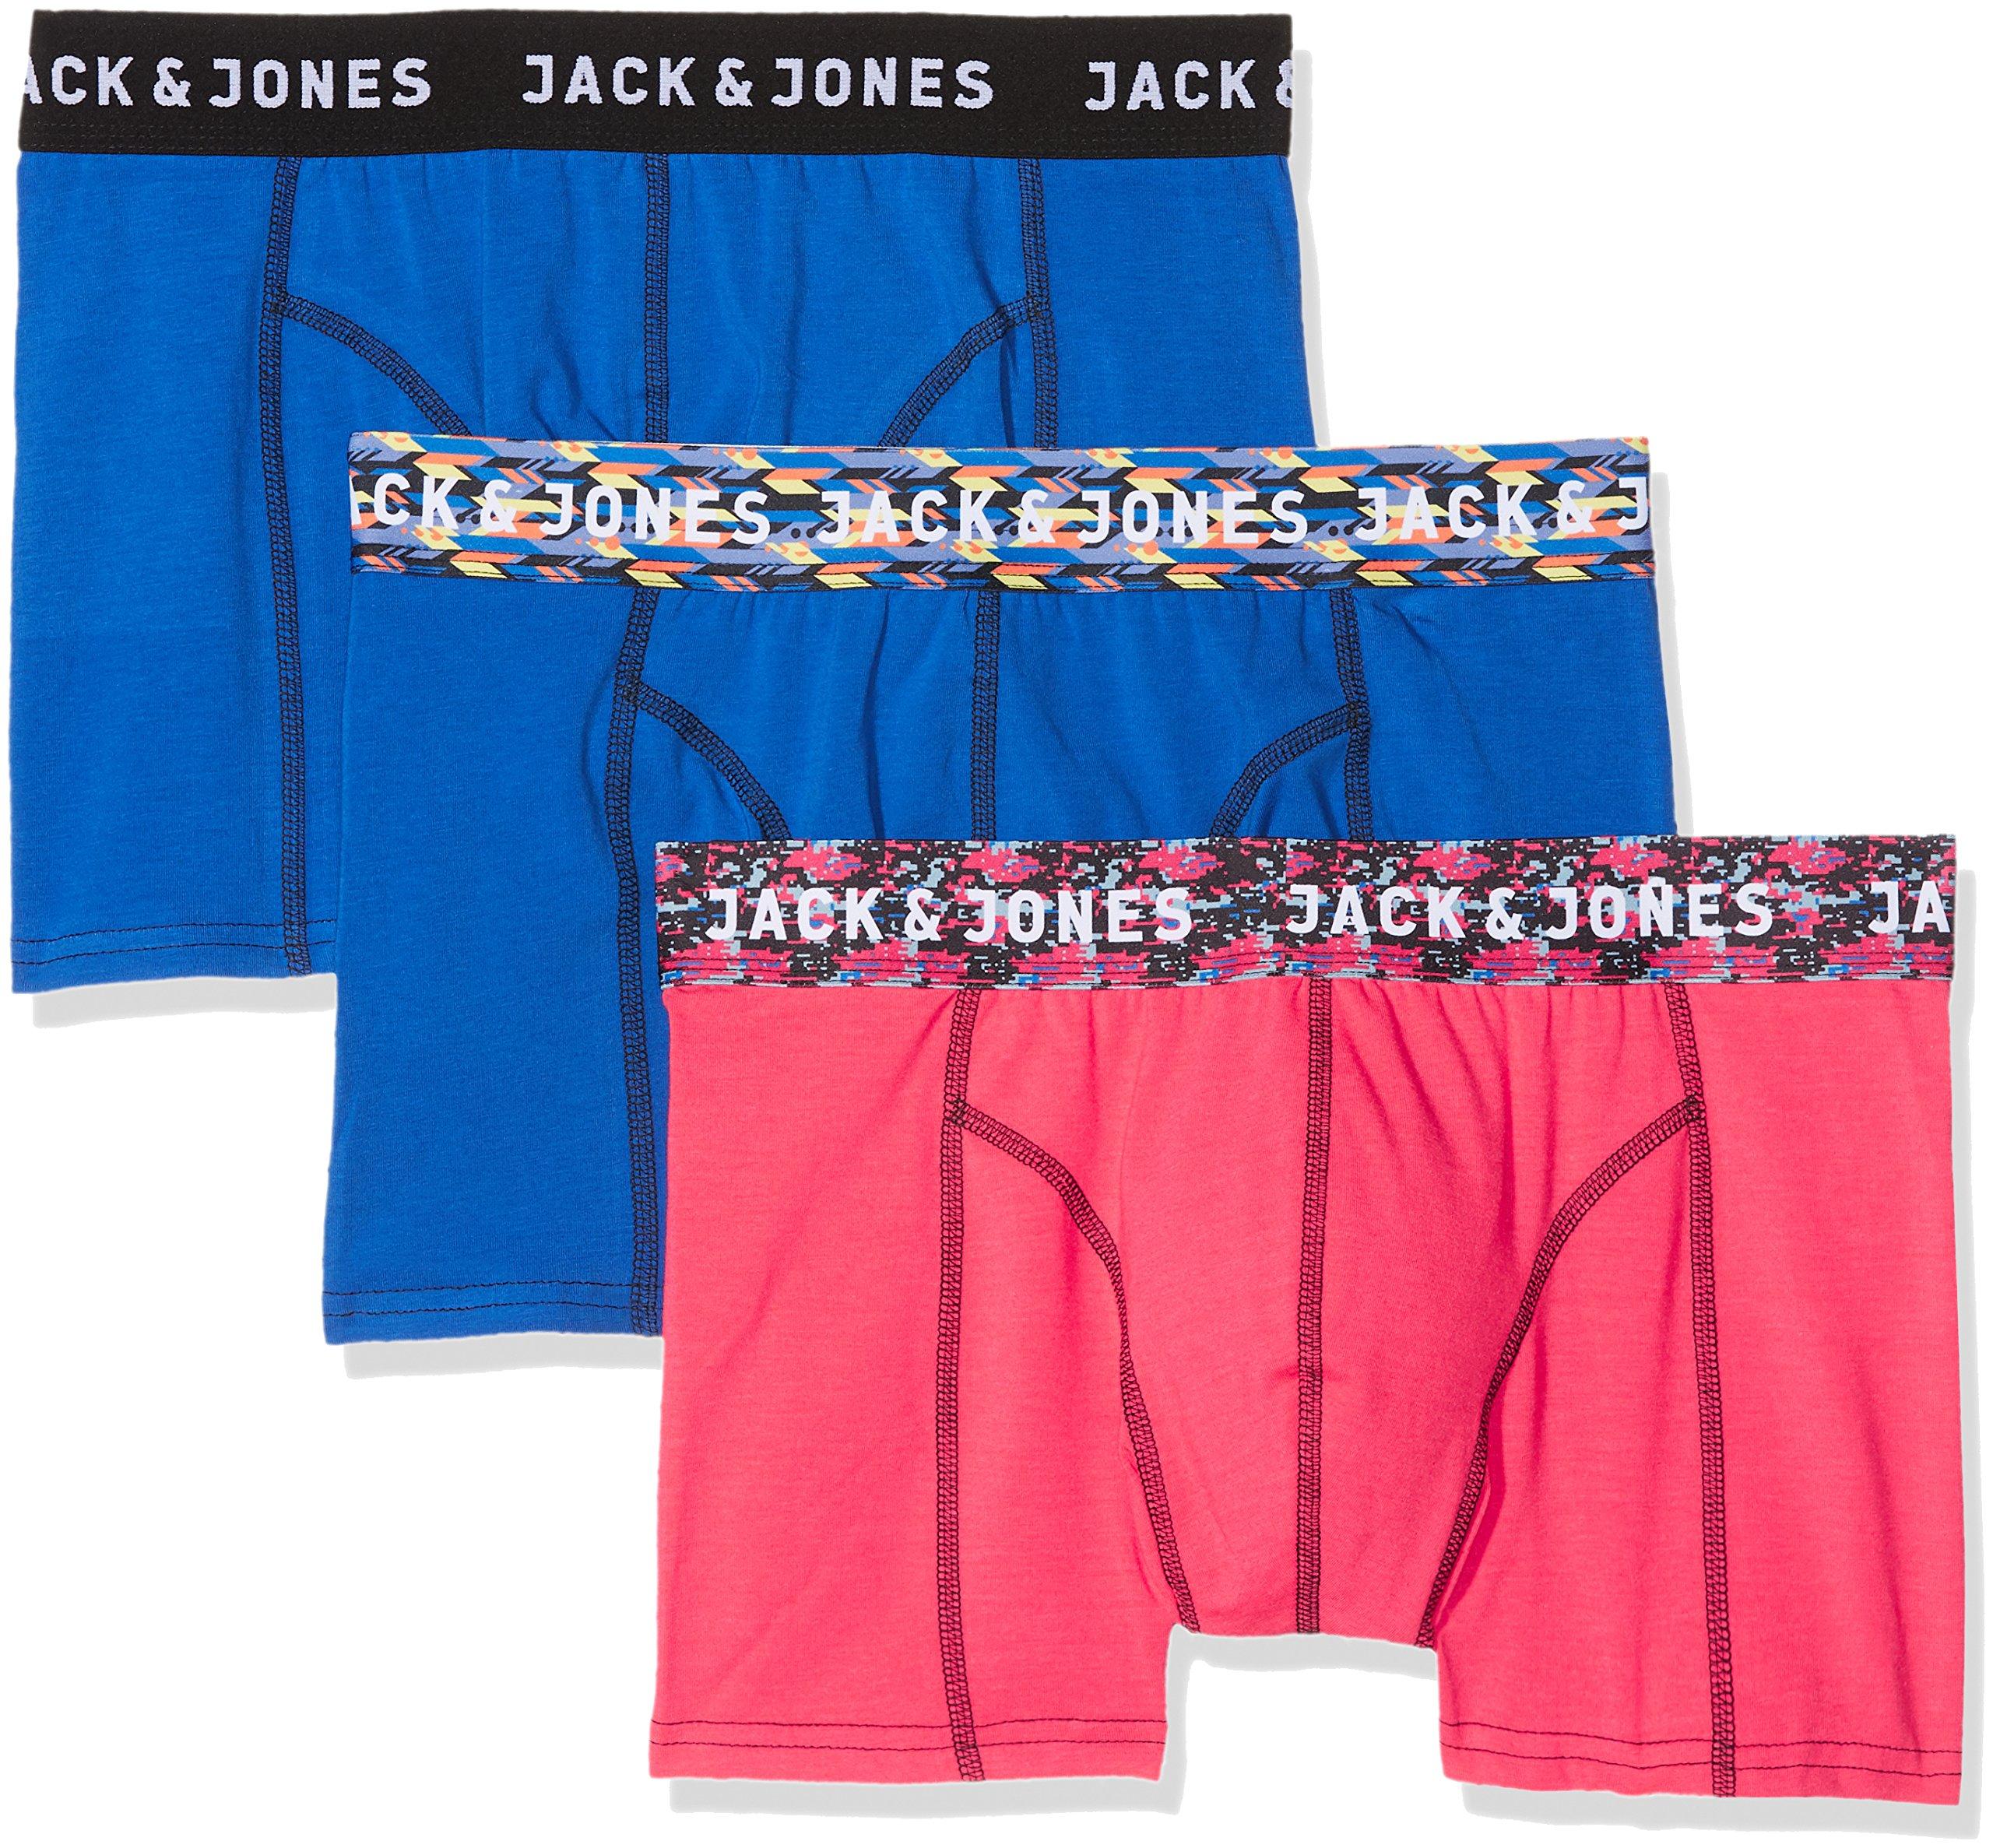 JACK & JONES Bóxer (Pack de 3 para Hombre